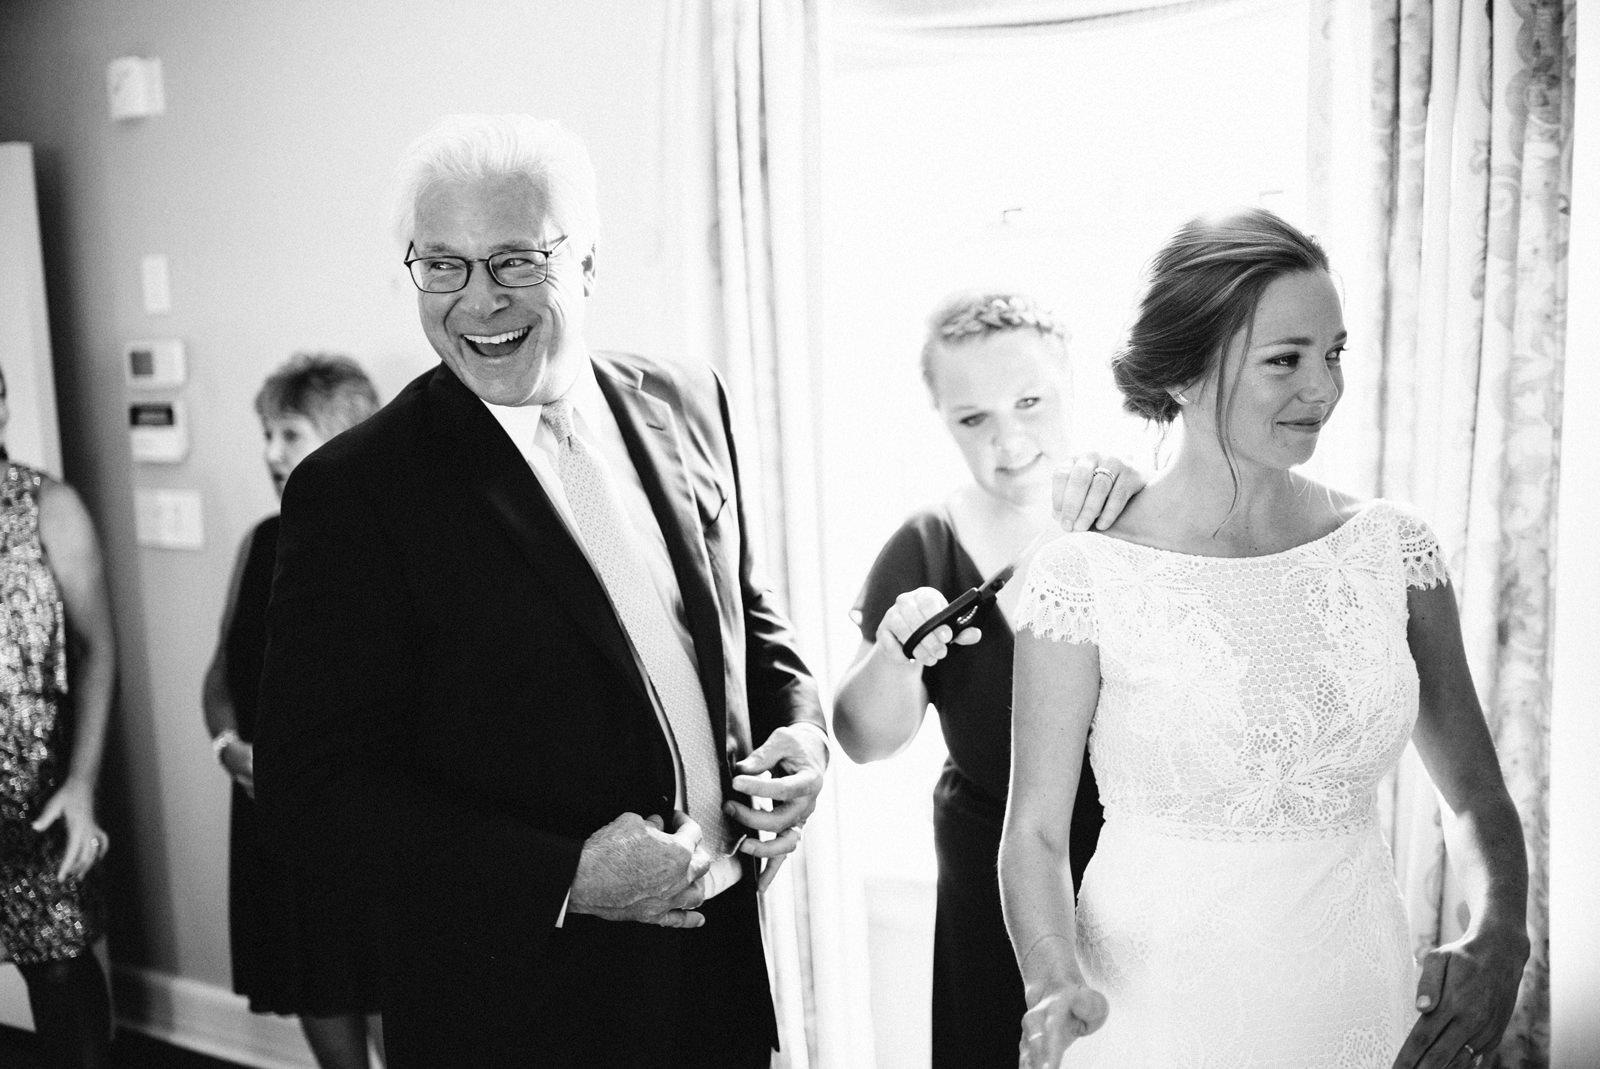 bridgeport-wedding-027 BRIDGEPORT, CONNECTICUT BACKYARD WEDDING